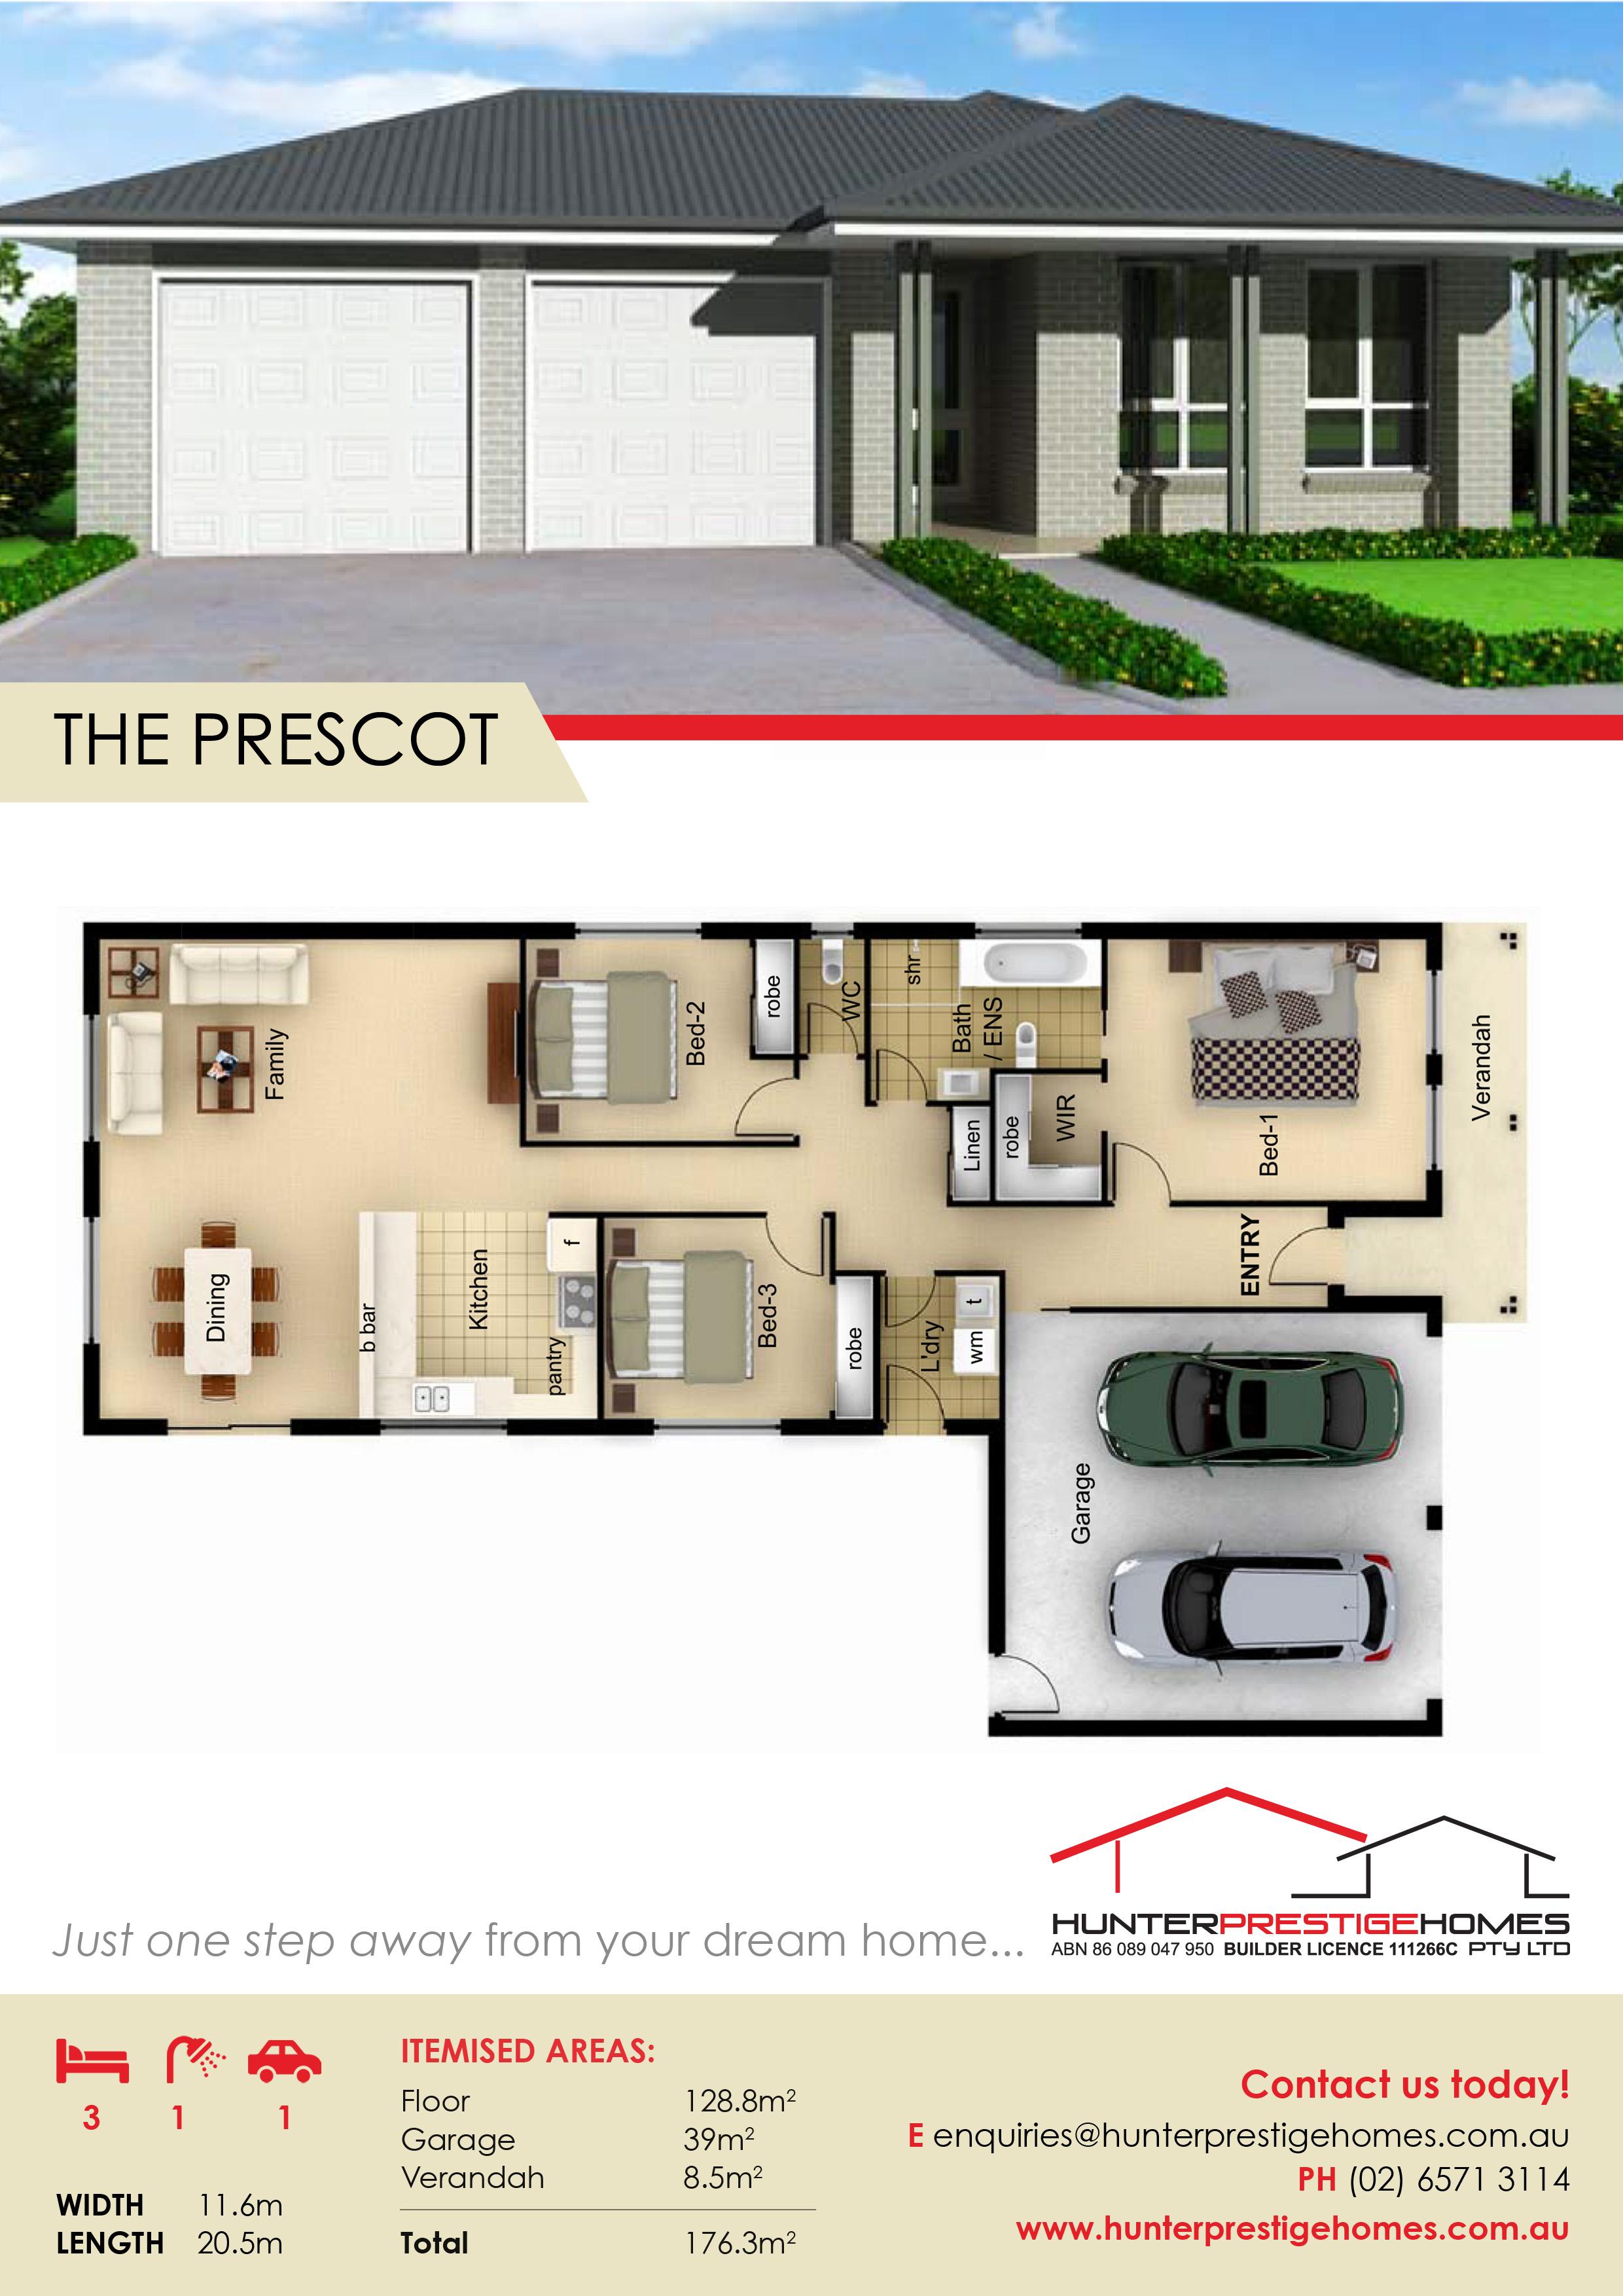 Prescot_HPH_Brochure